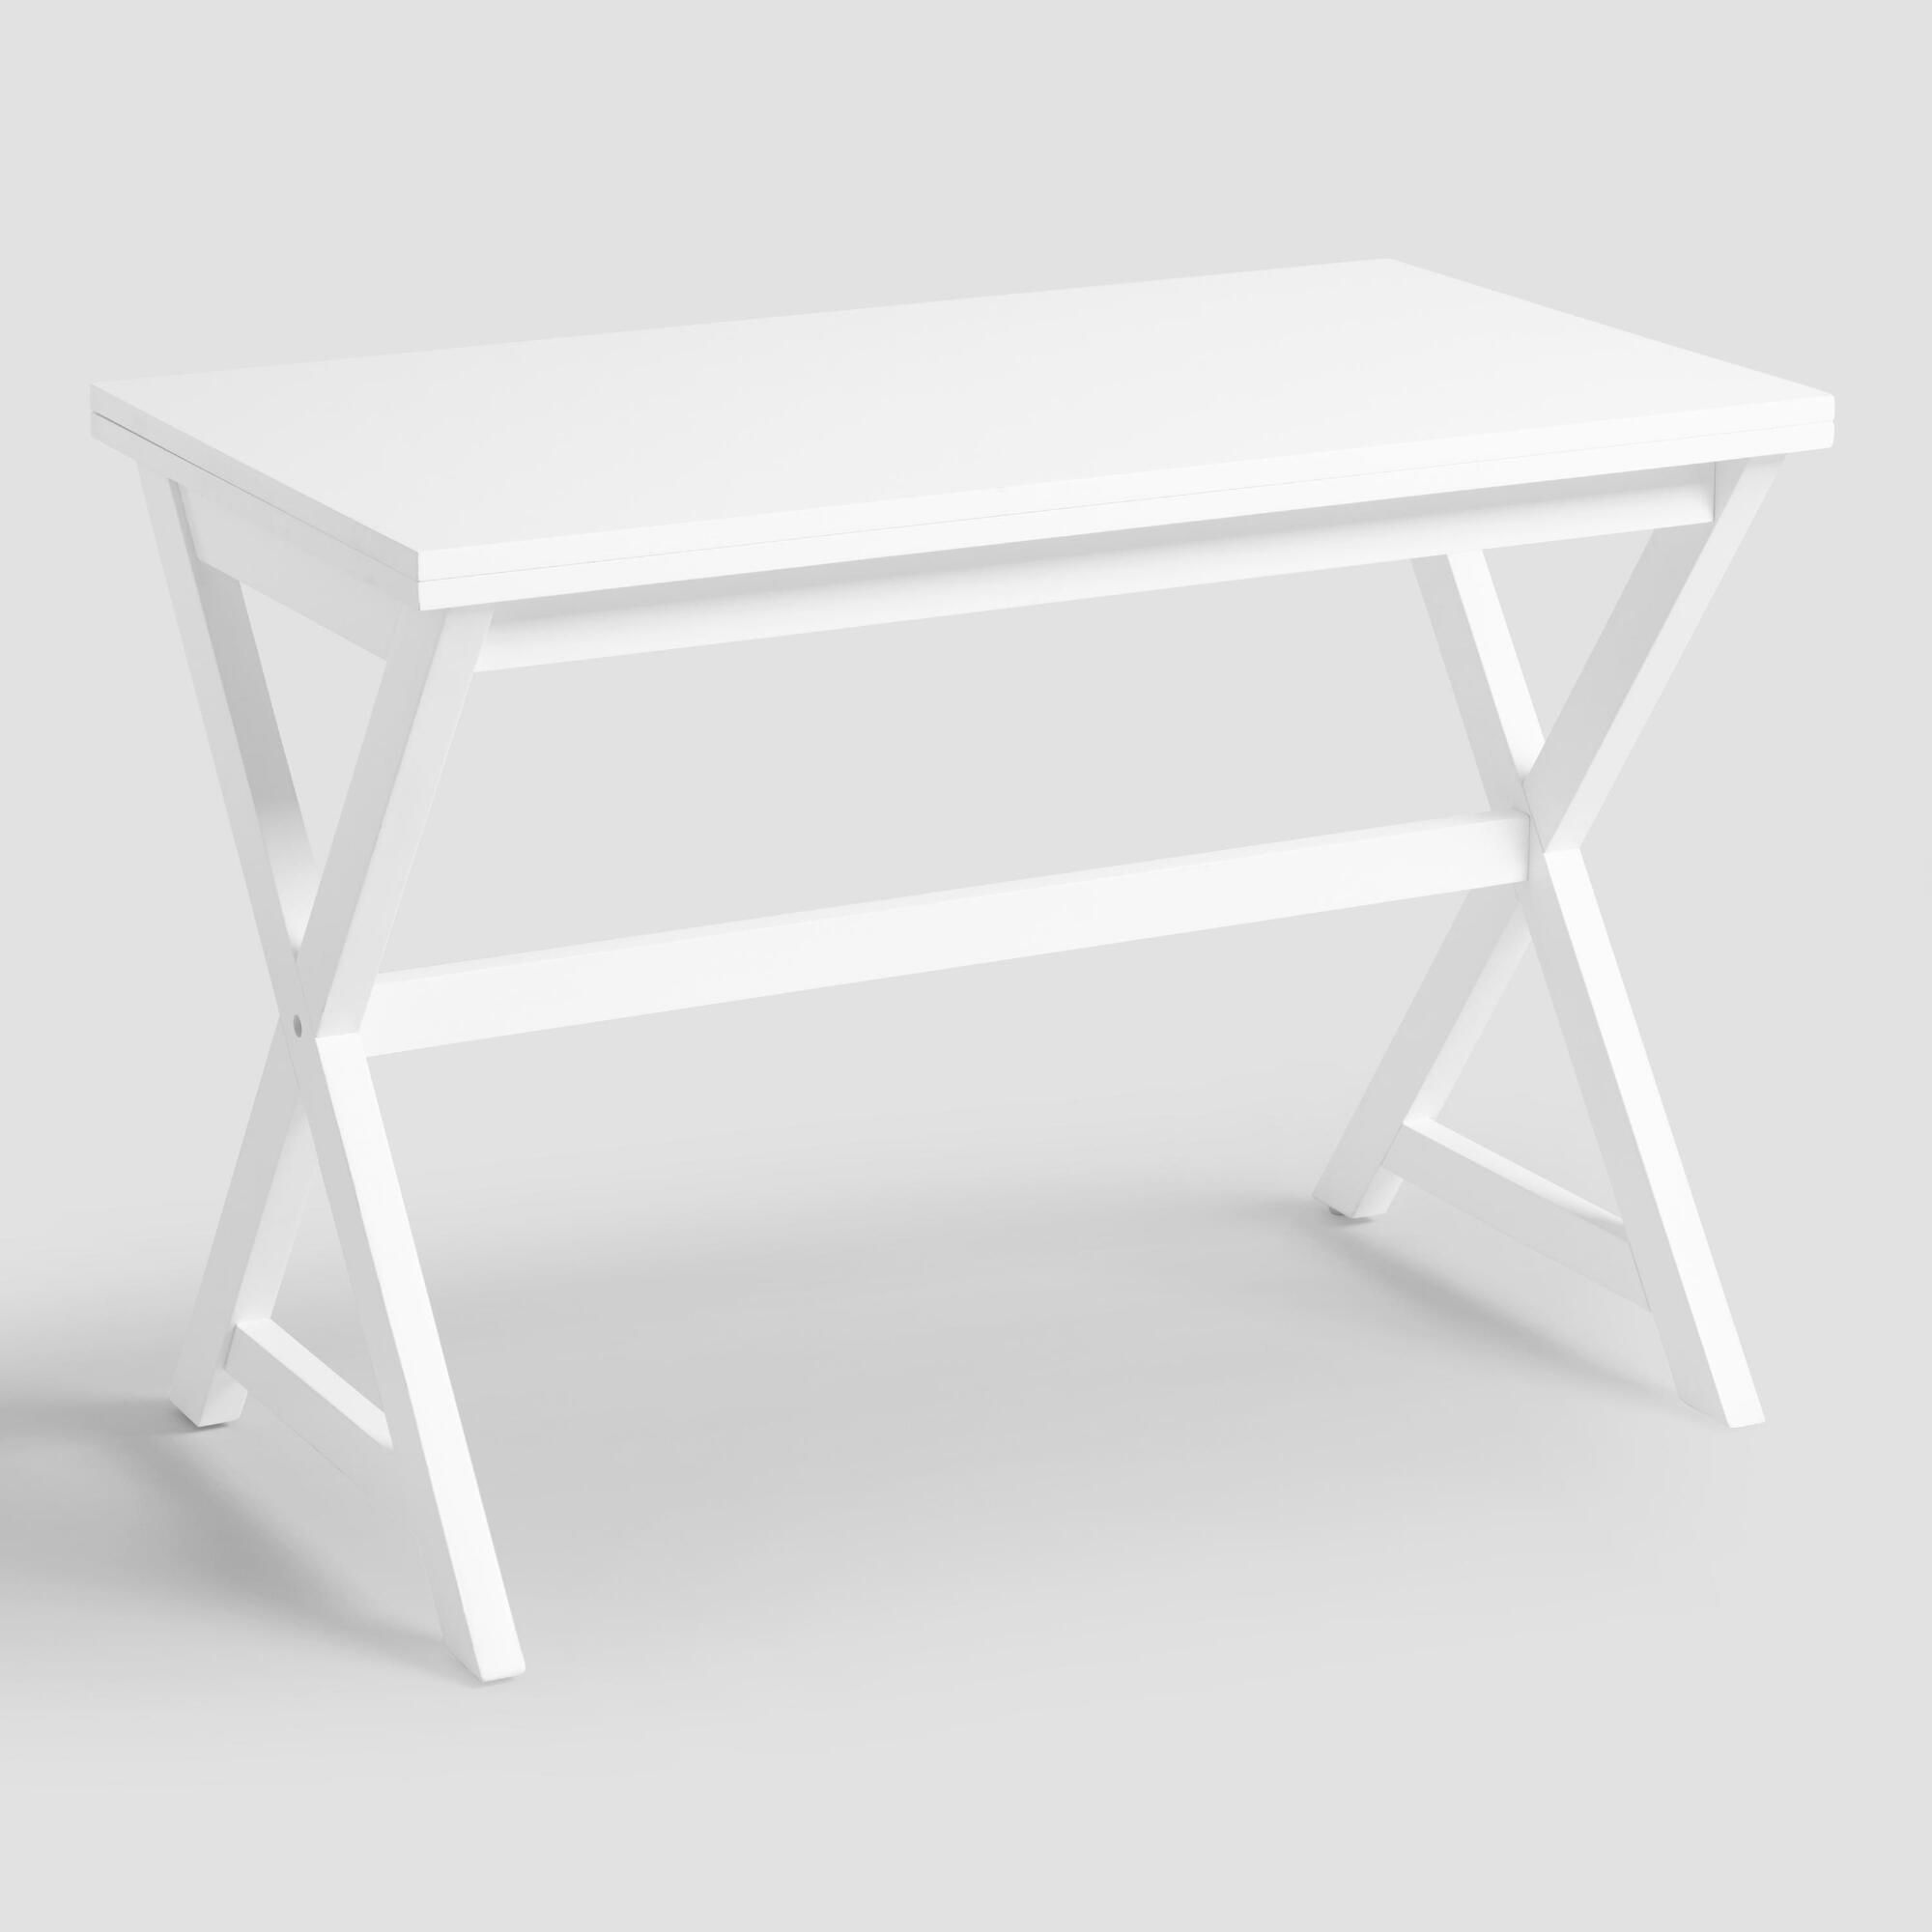 99 Corner Desk Under 100 Modern Home Office Furniture Check More At Http Www Sewcra Modern Home Office Furniture Home Office Furniture Sets Flip Top Desk